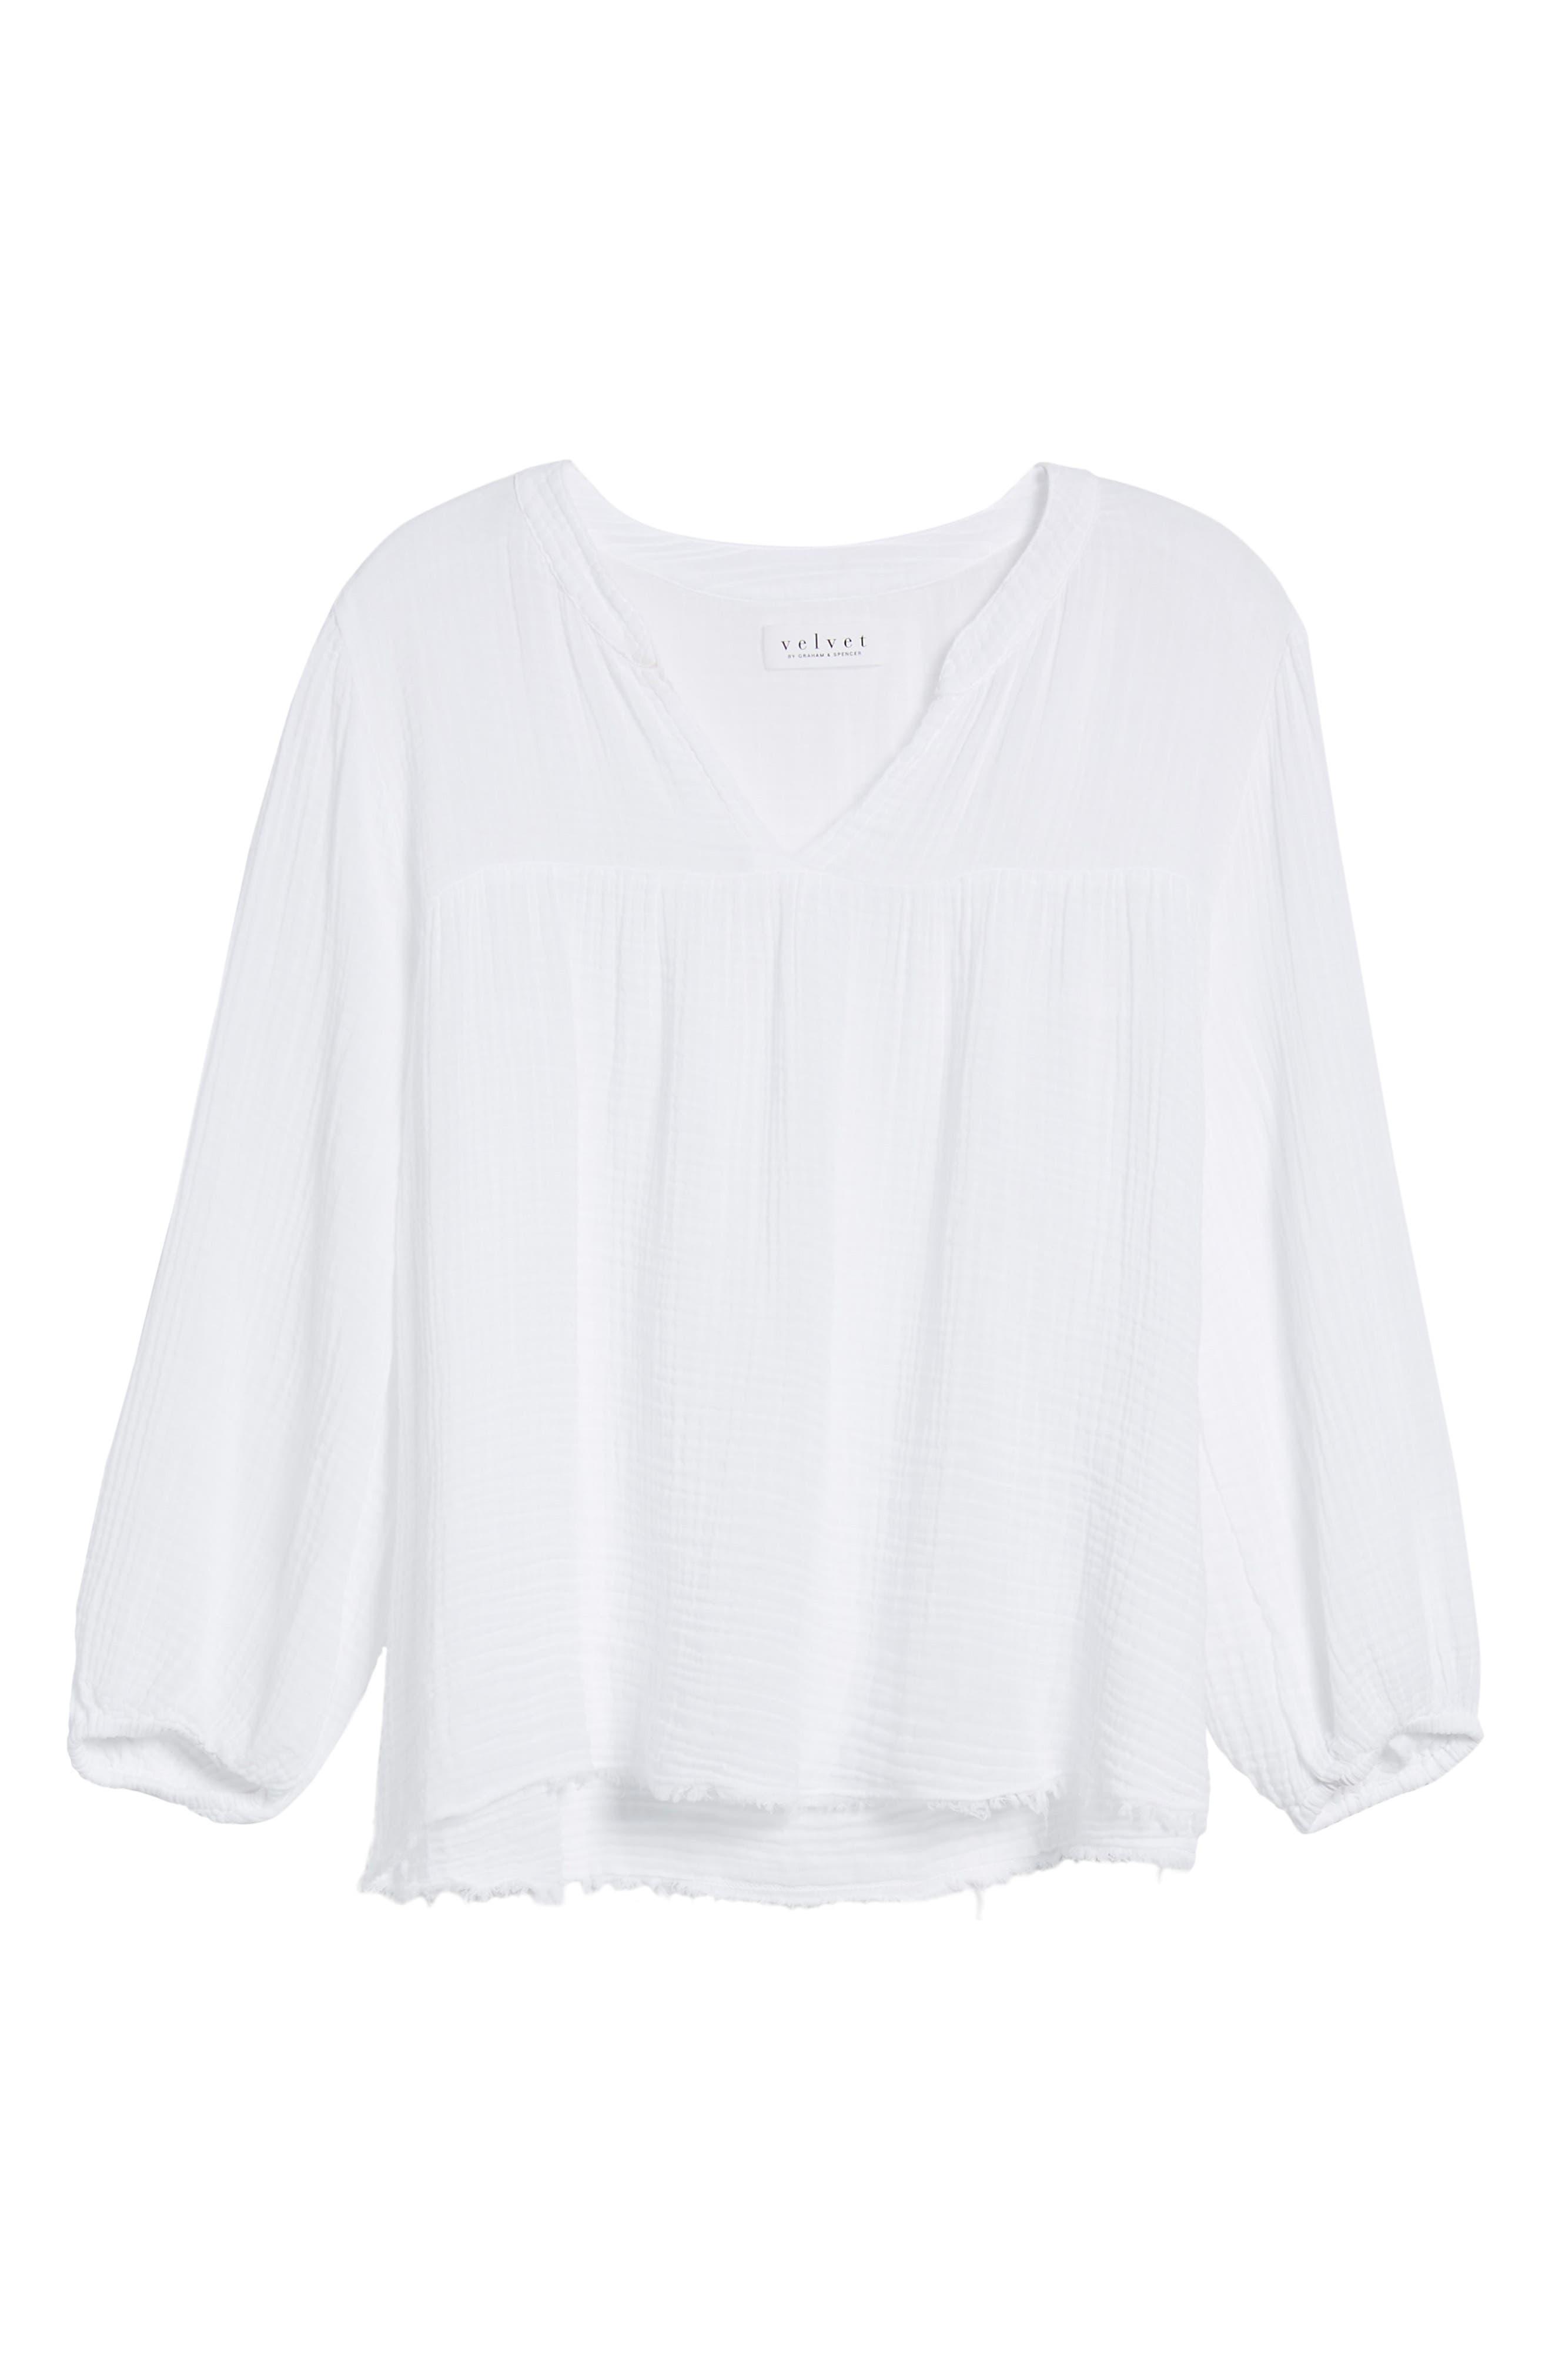 Cotton Gauze Peasant Top,                             Alternate thumbnail 7, color,                             White